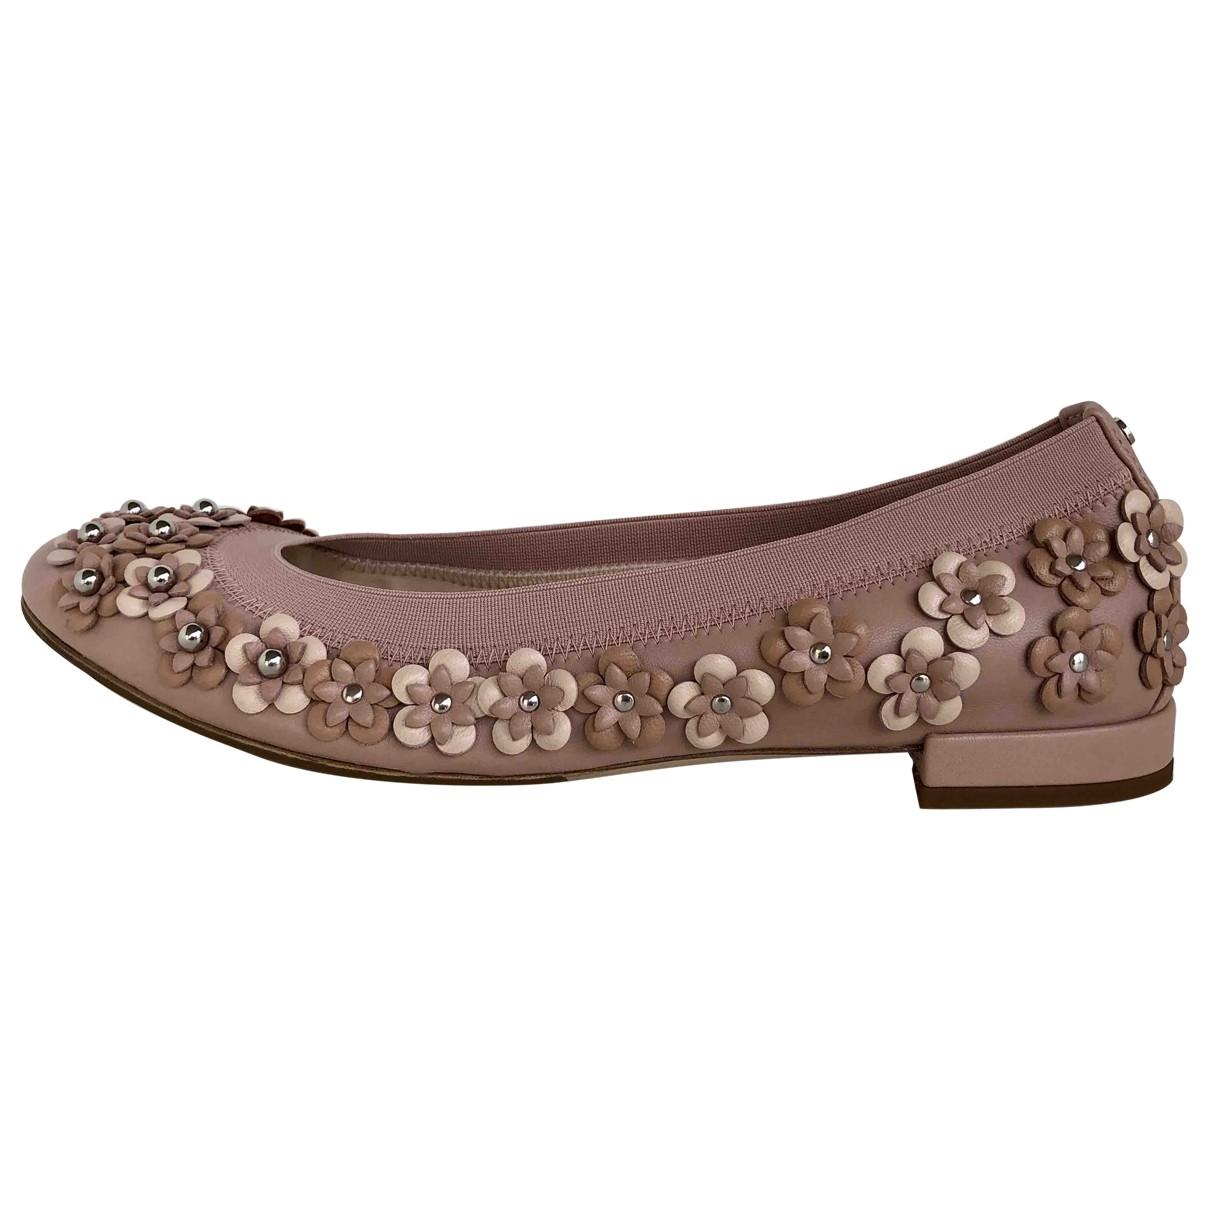 Dior \N Ballerinas in  Beige Leder